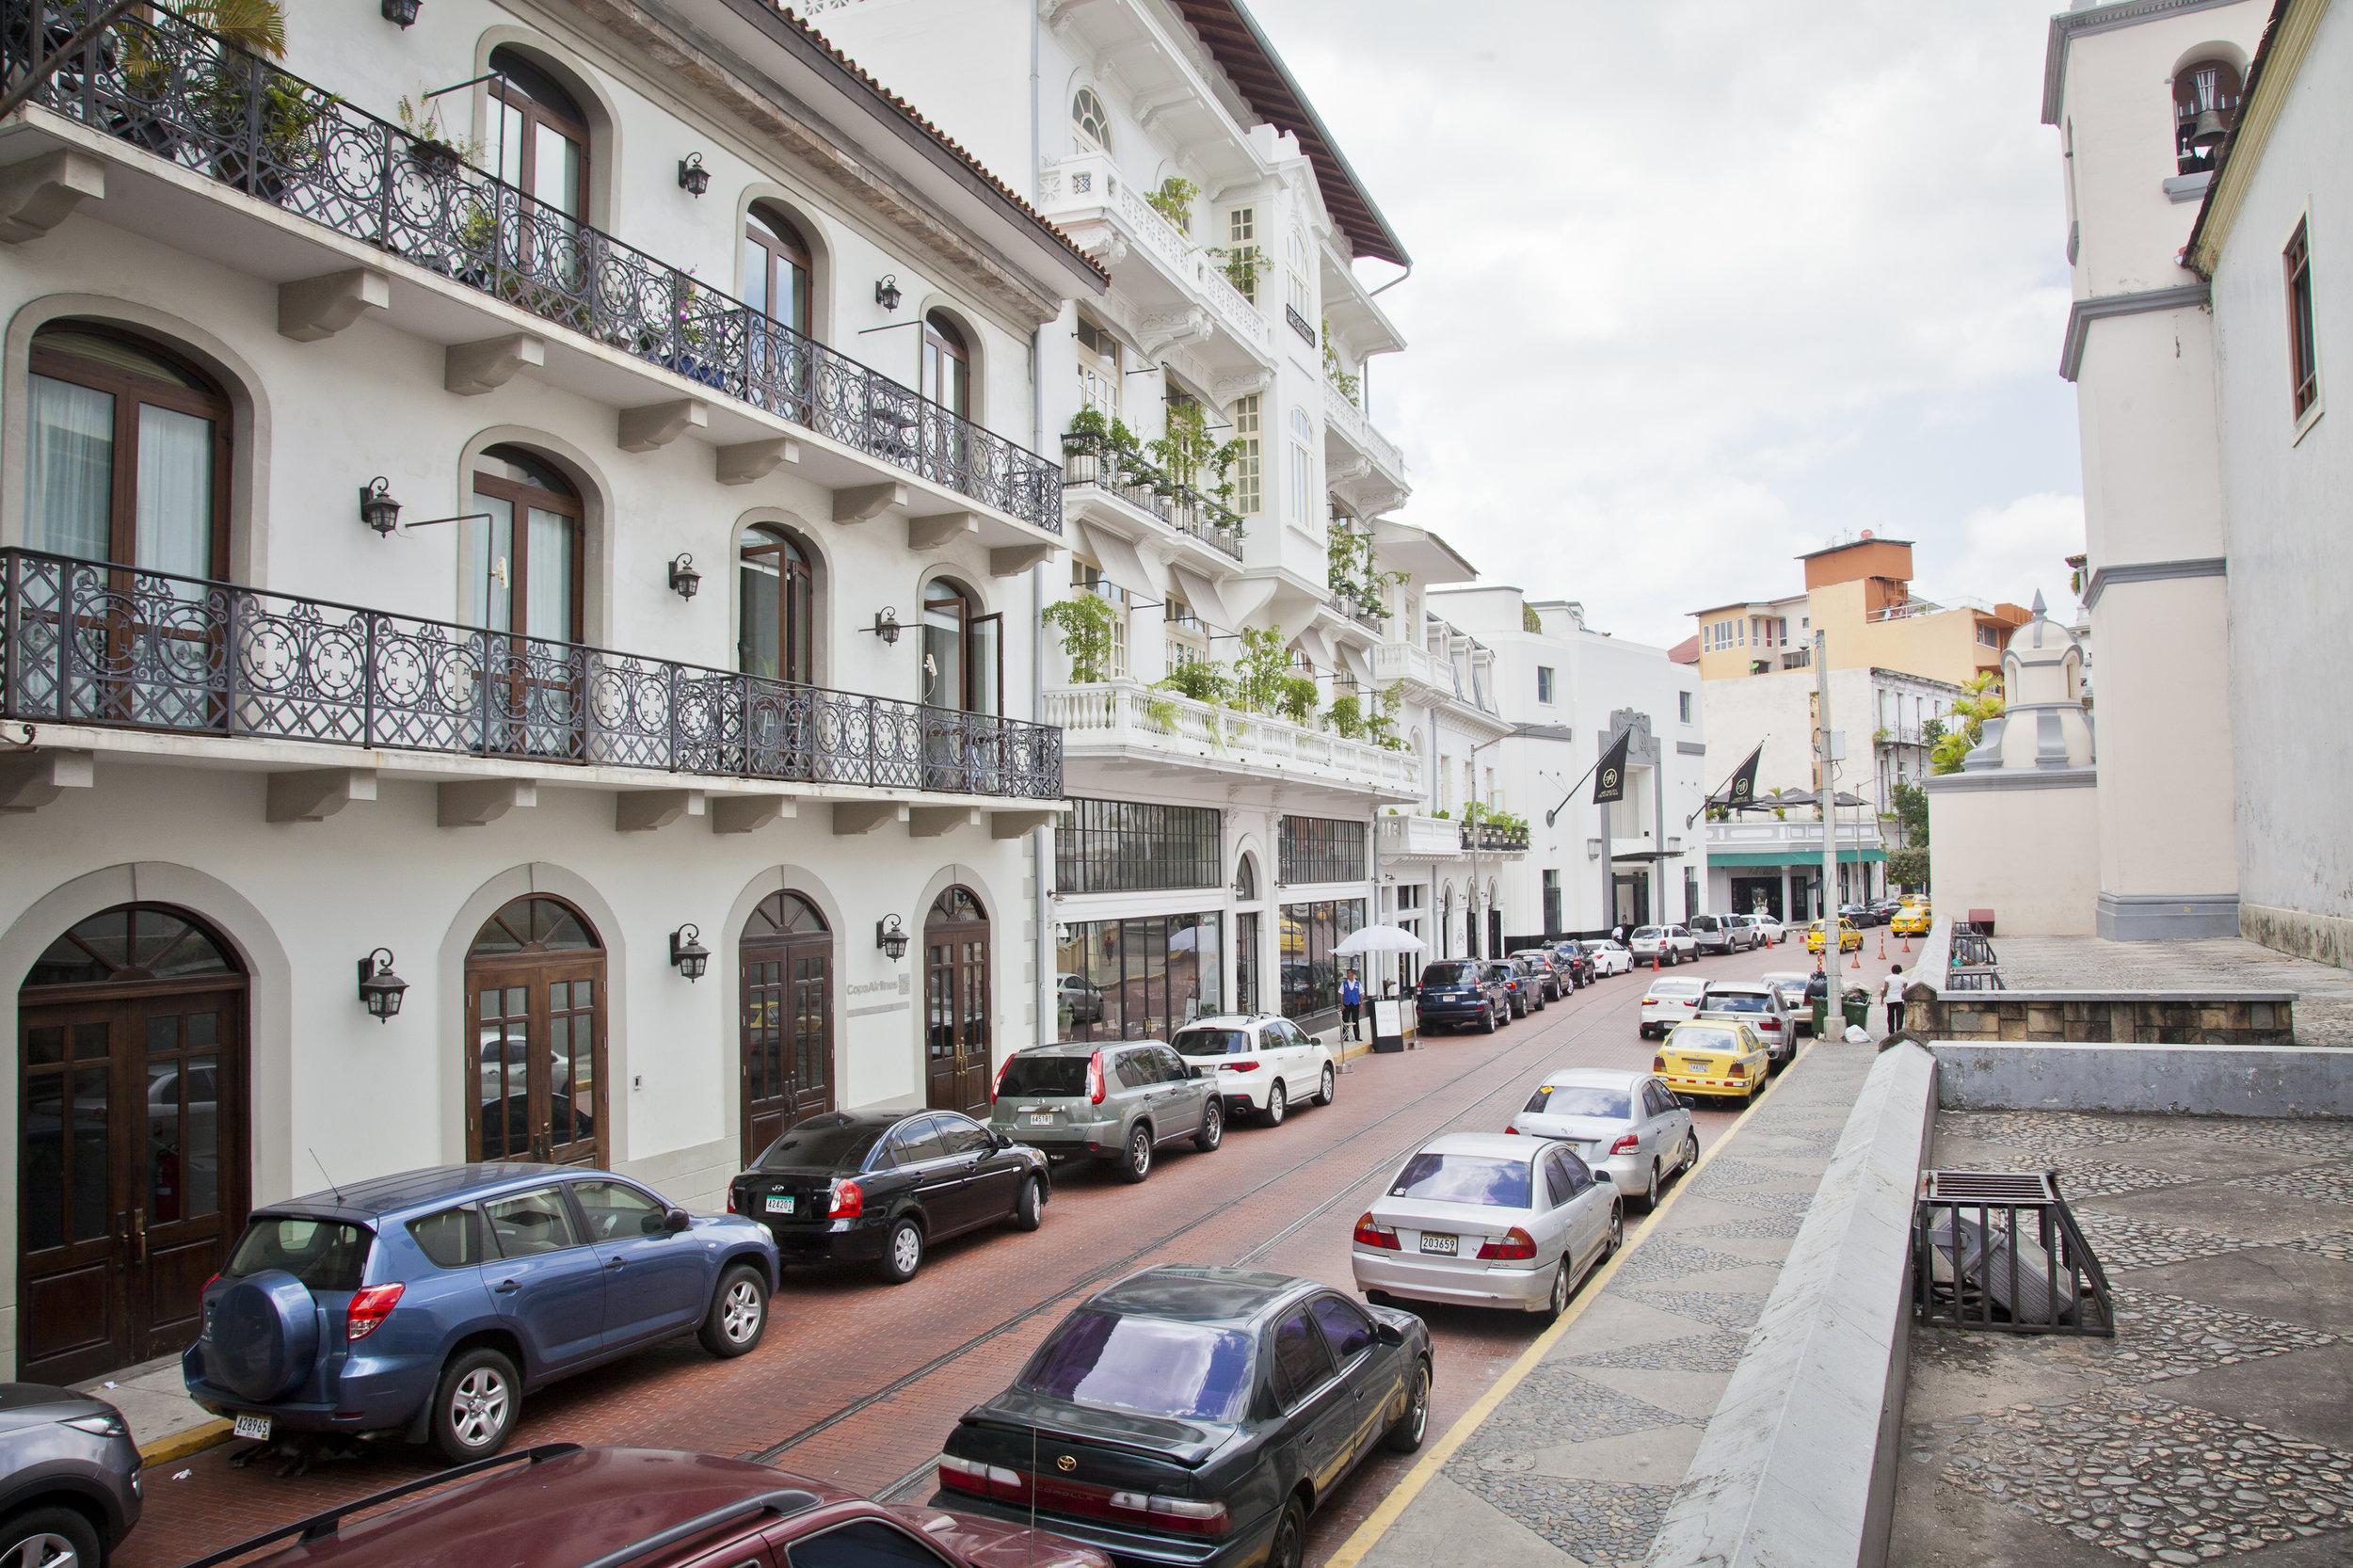 Casa Viejo Panama - Across the Blue Planet